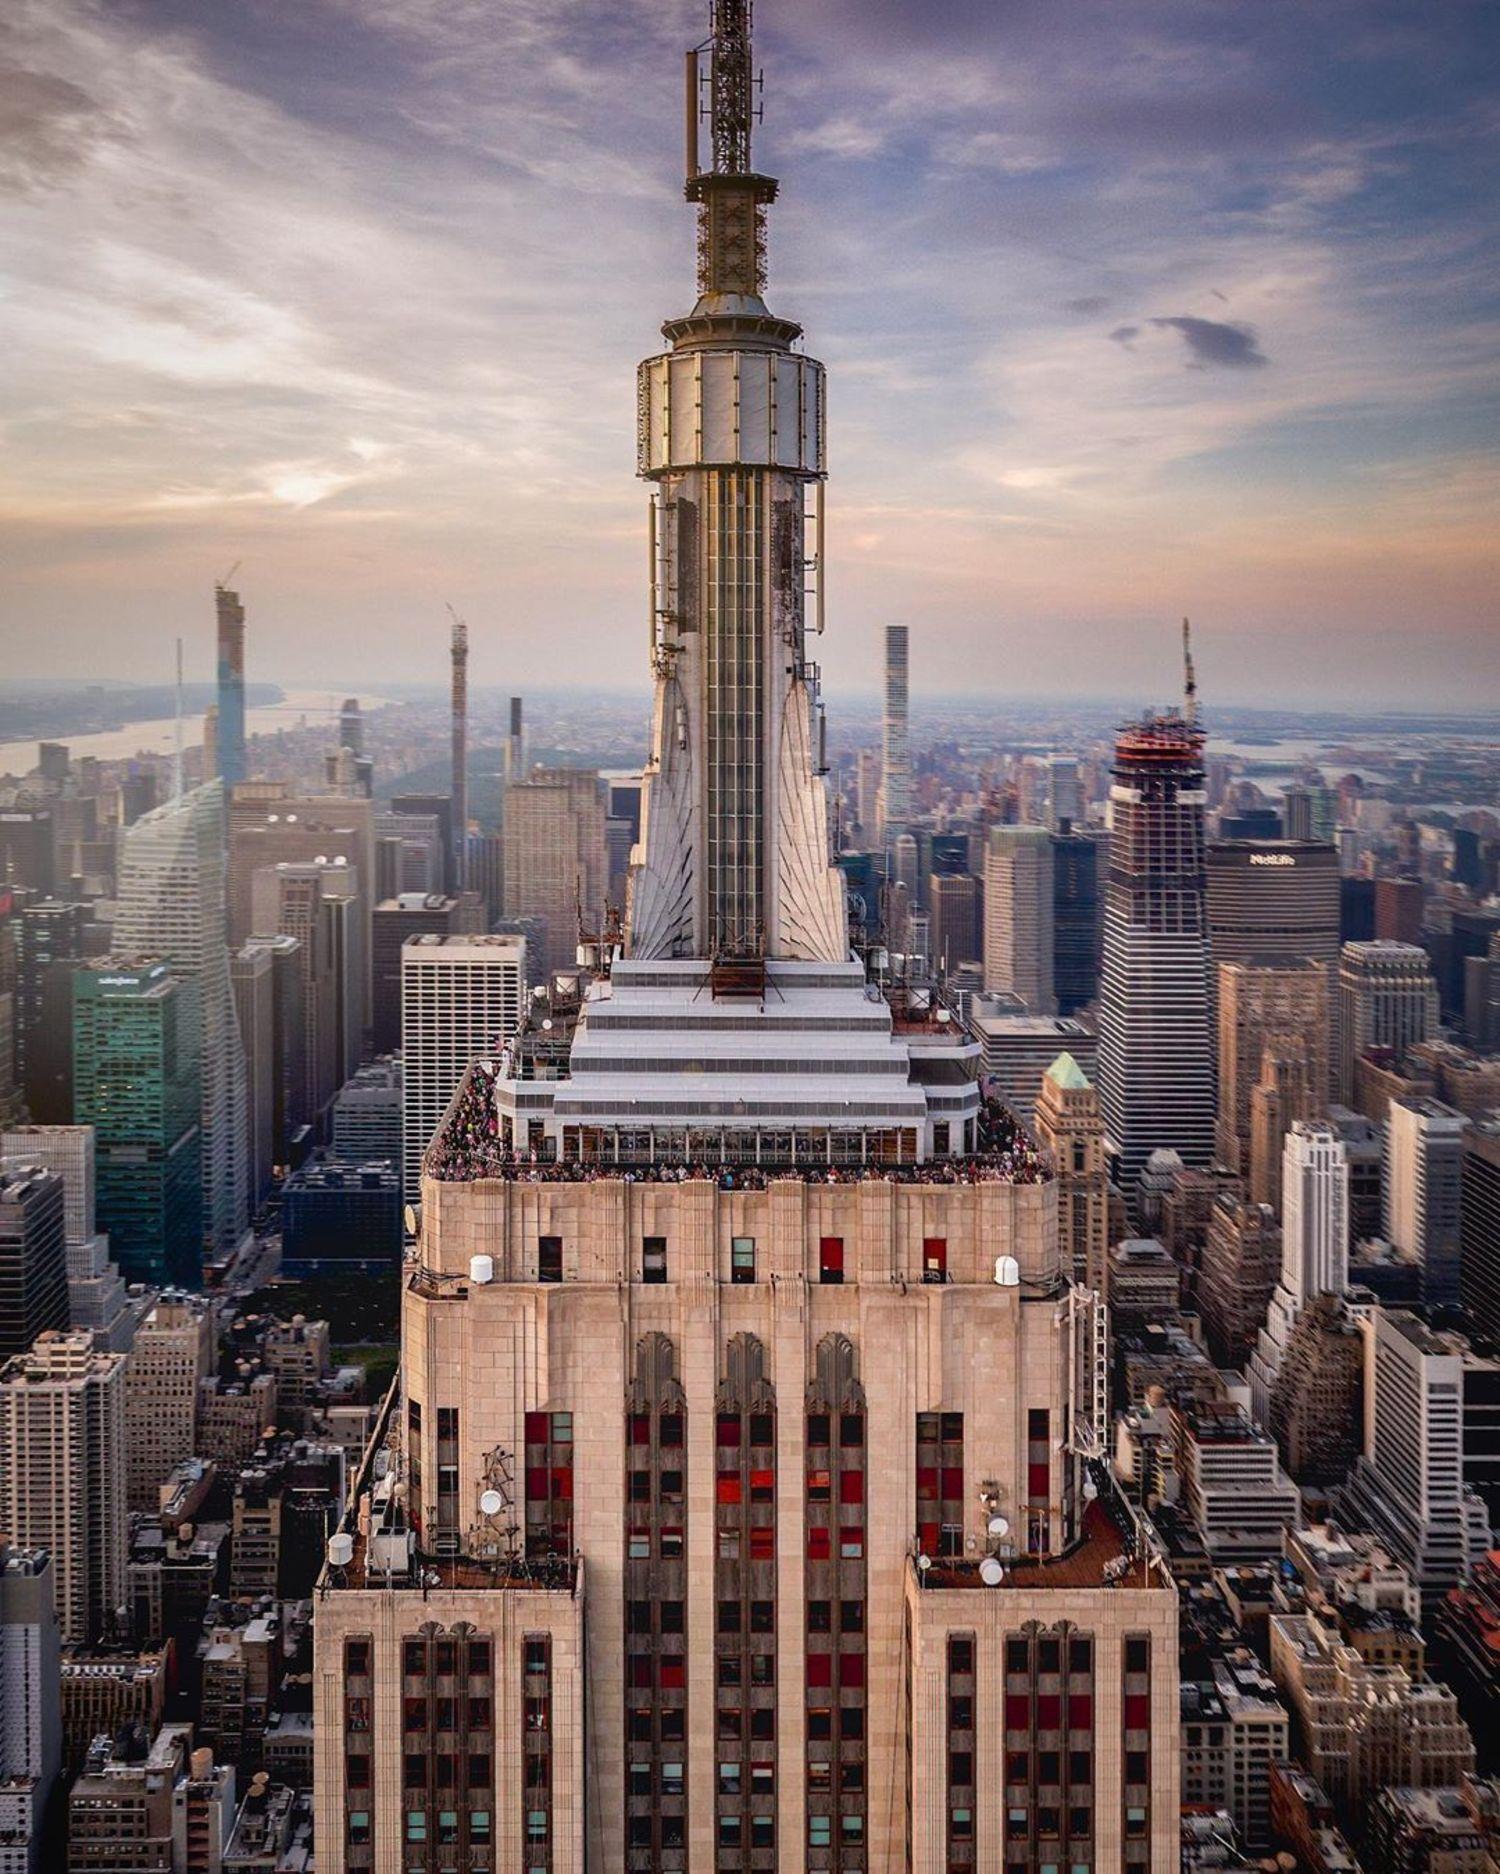 Empire State Building, New York, New York